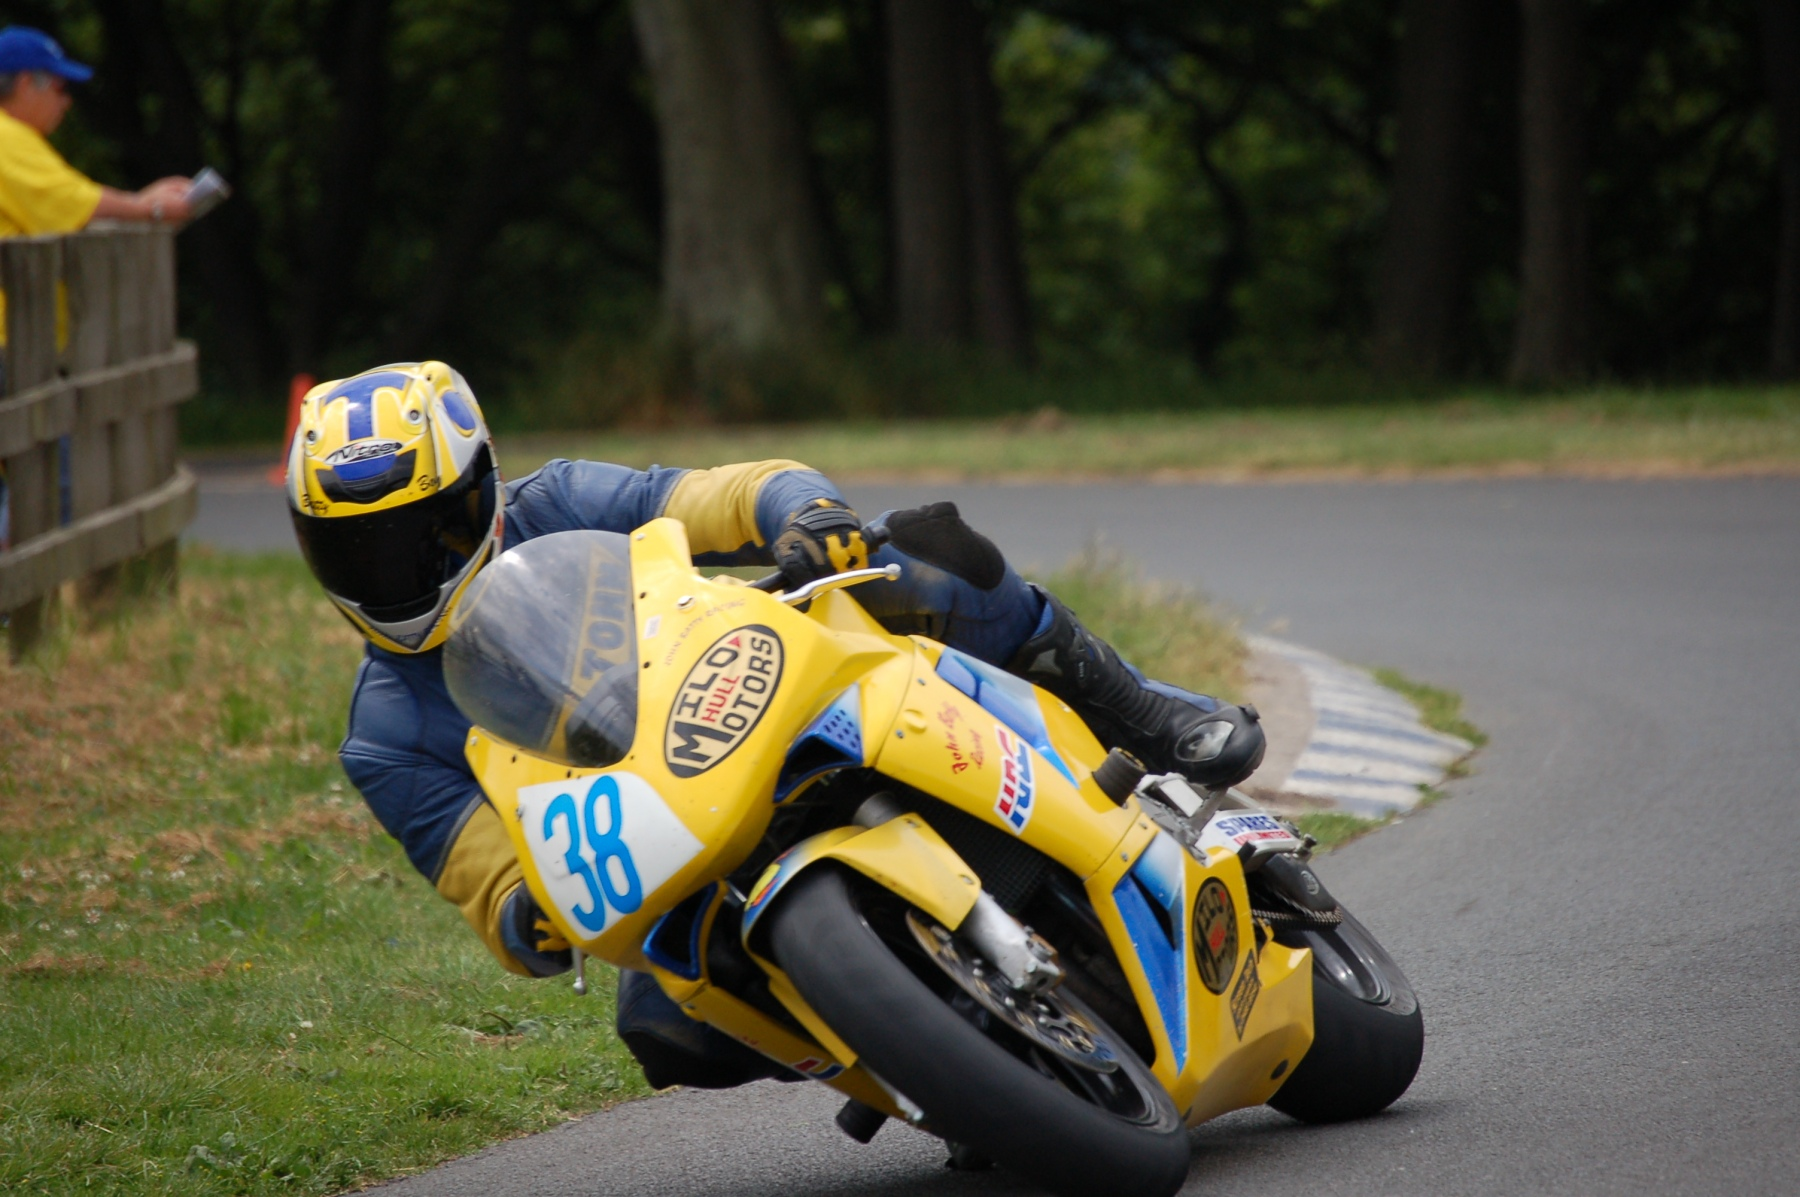 Honda CBR600RR 2003-04<p>A16 Race Fairing & Seat</p>